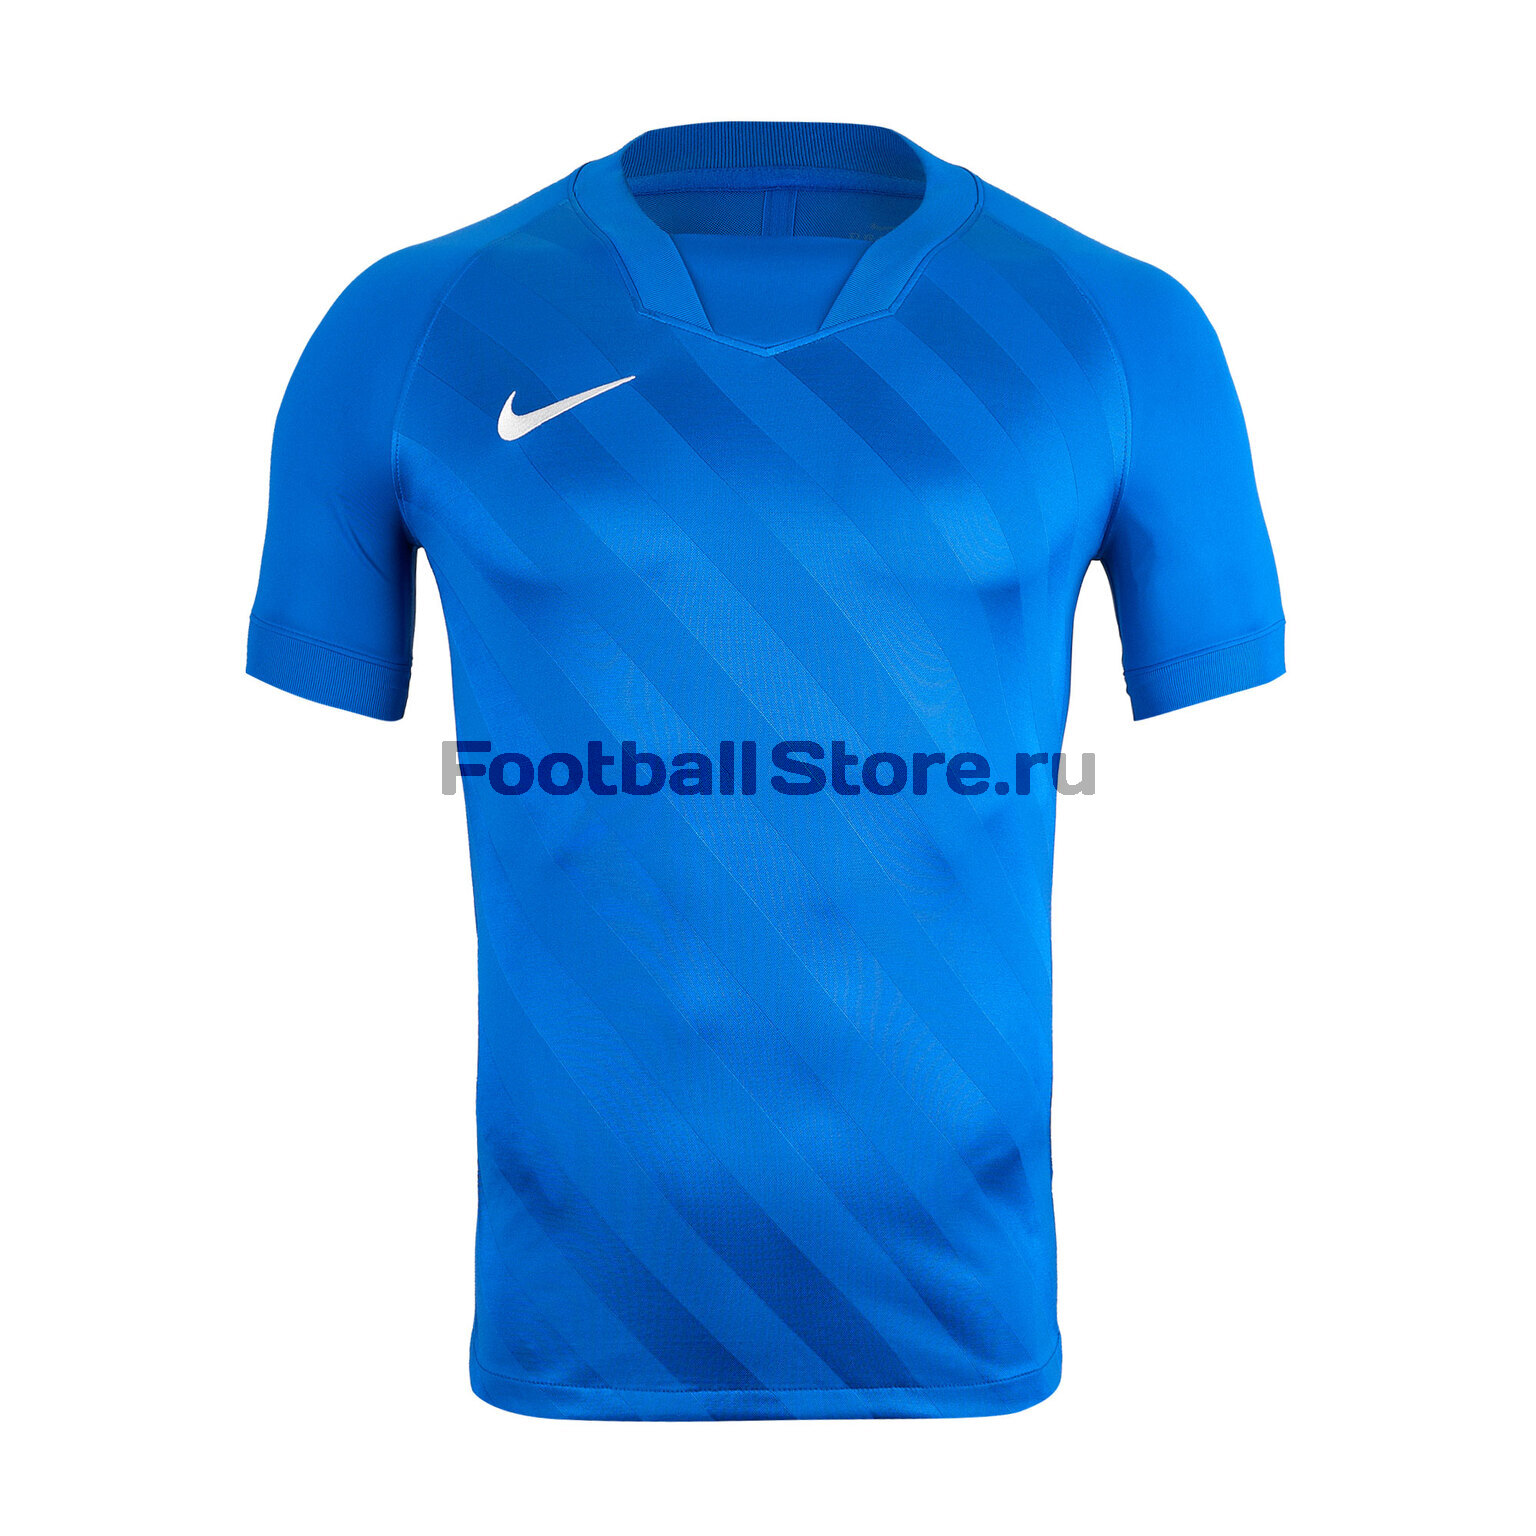 Футболка игровая Nike Dry Challenge III BV6703-463 цена и фото